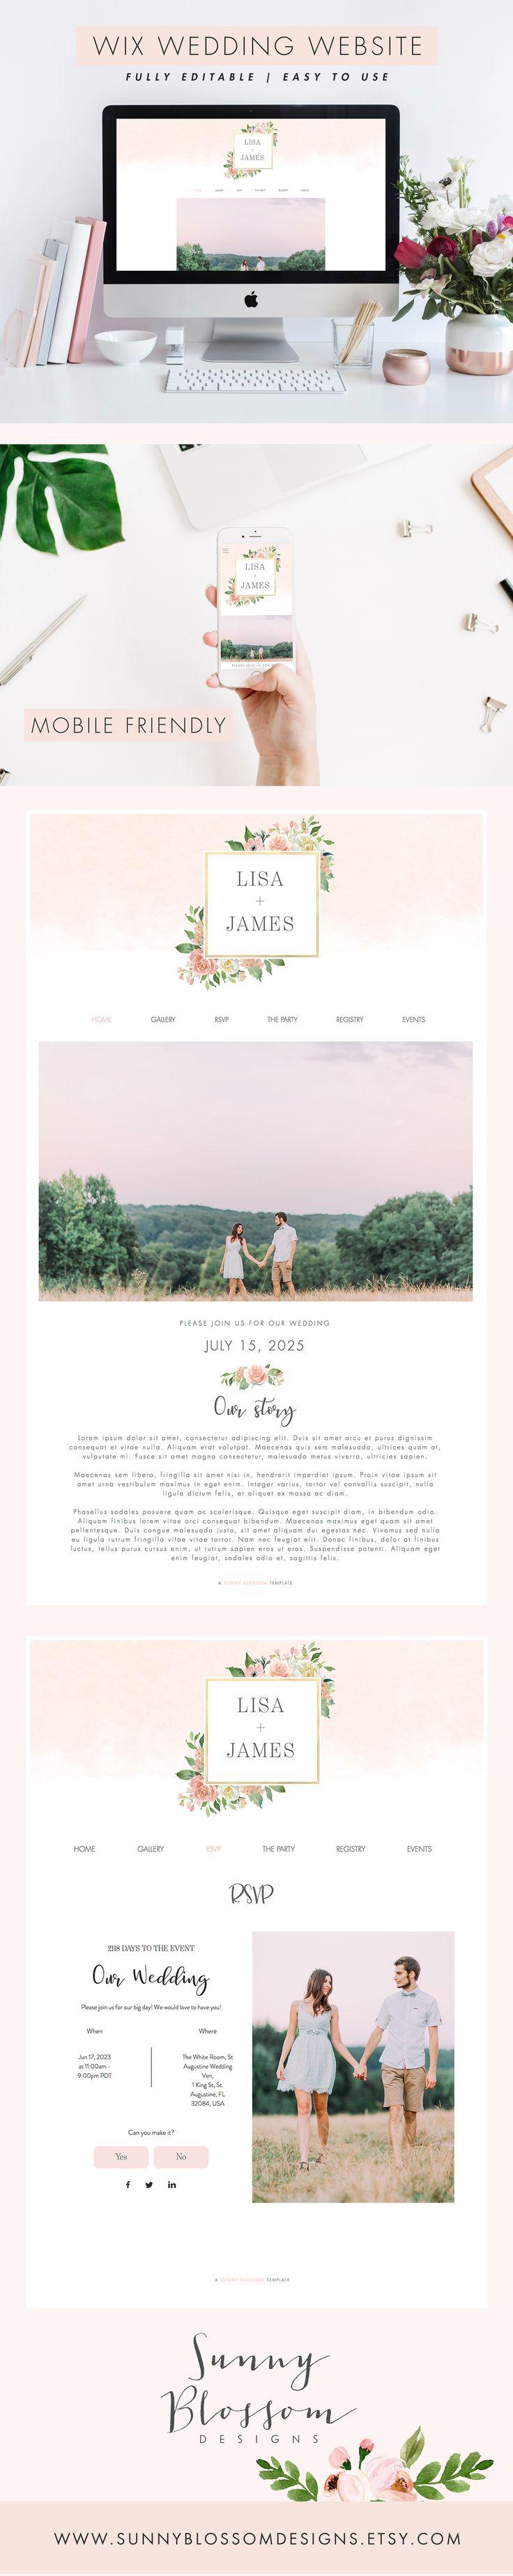 Best Free Wedding Websites Ideas On Pinterest Wedding